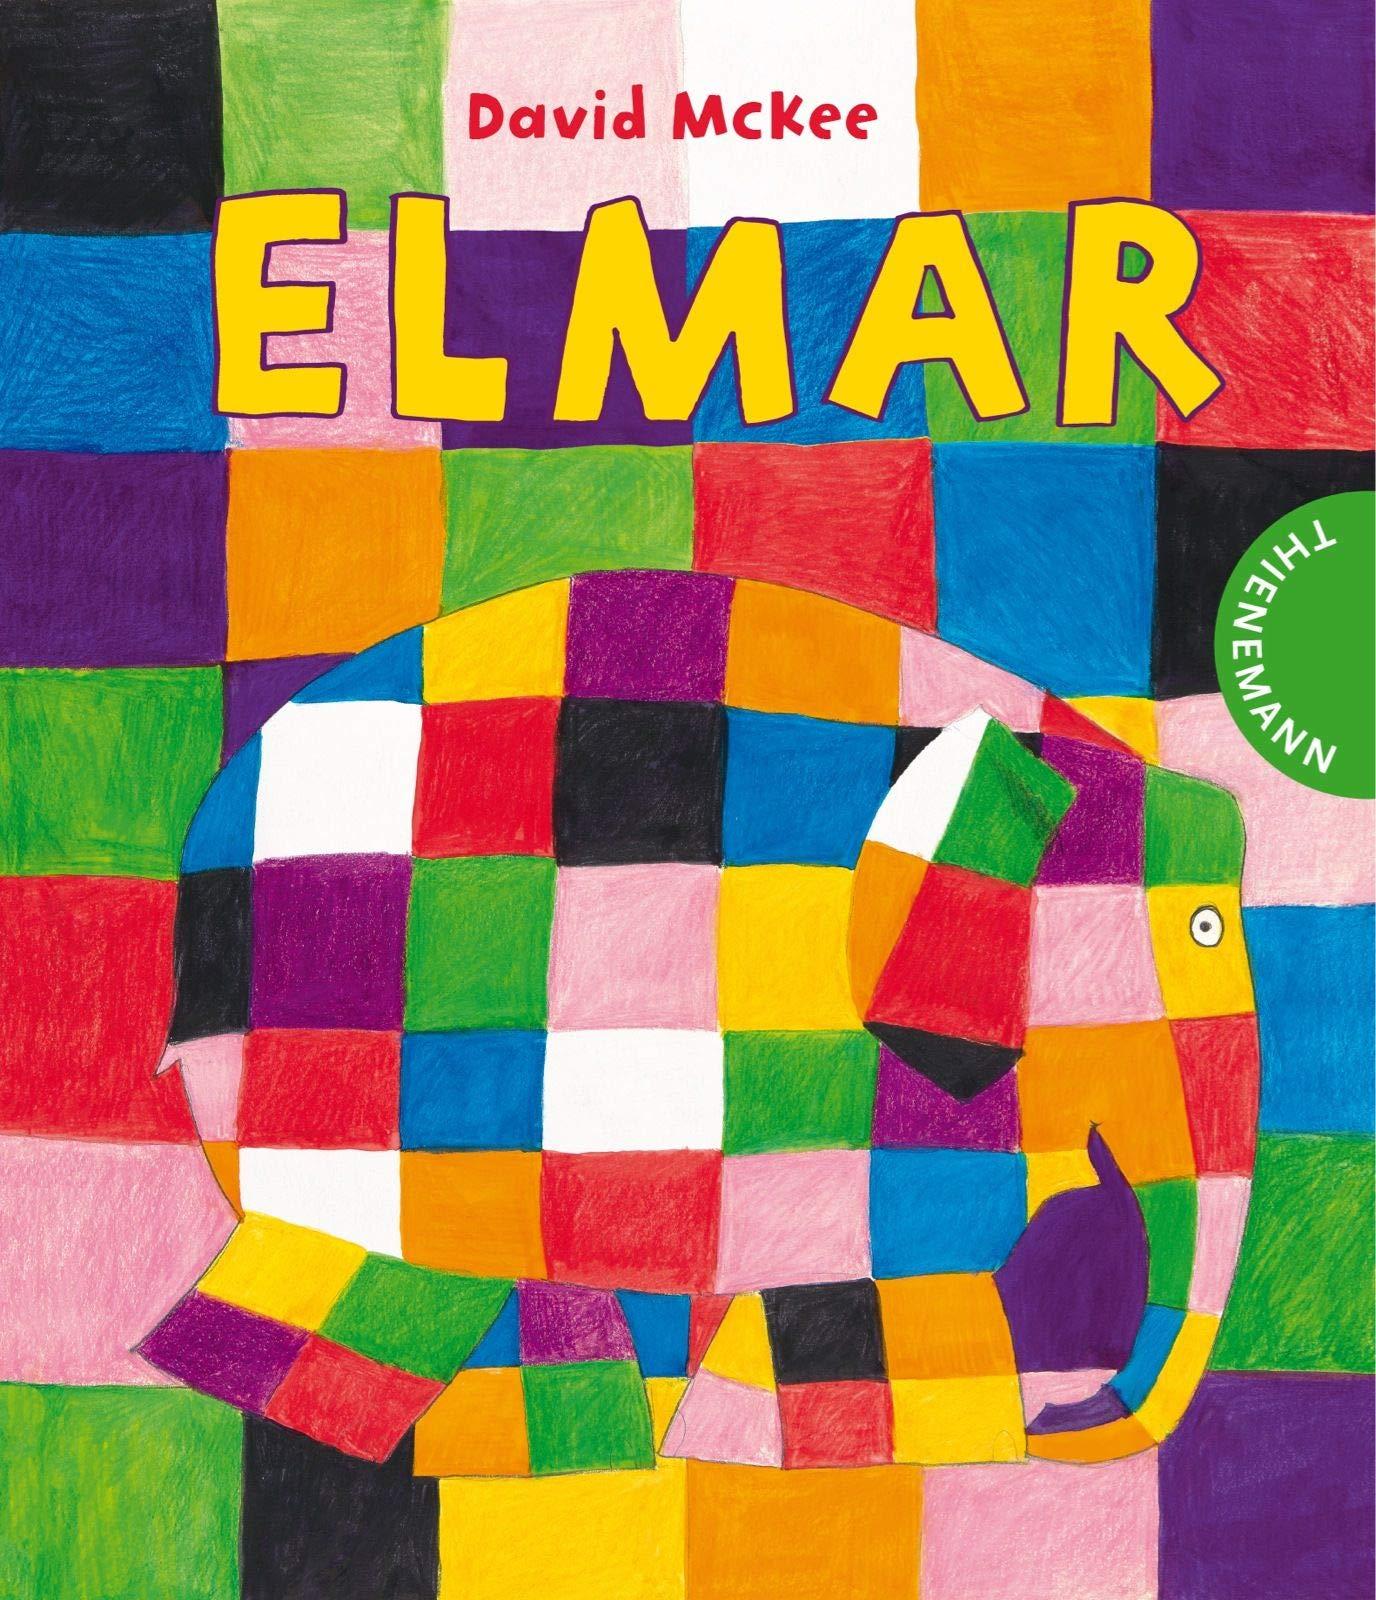 Elmar. Mini-Bilderbuch (Primary Picture Books German): Amazon.es: McKee, David, Lenzen, Georg: Libros en idiomas extranjeros